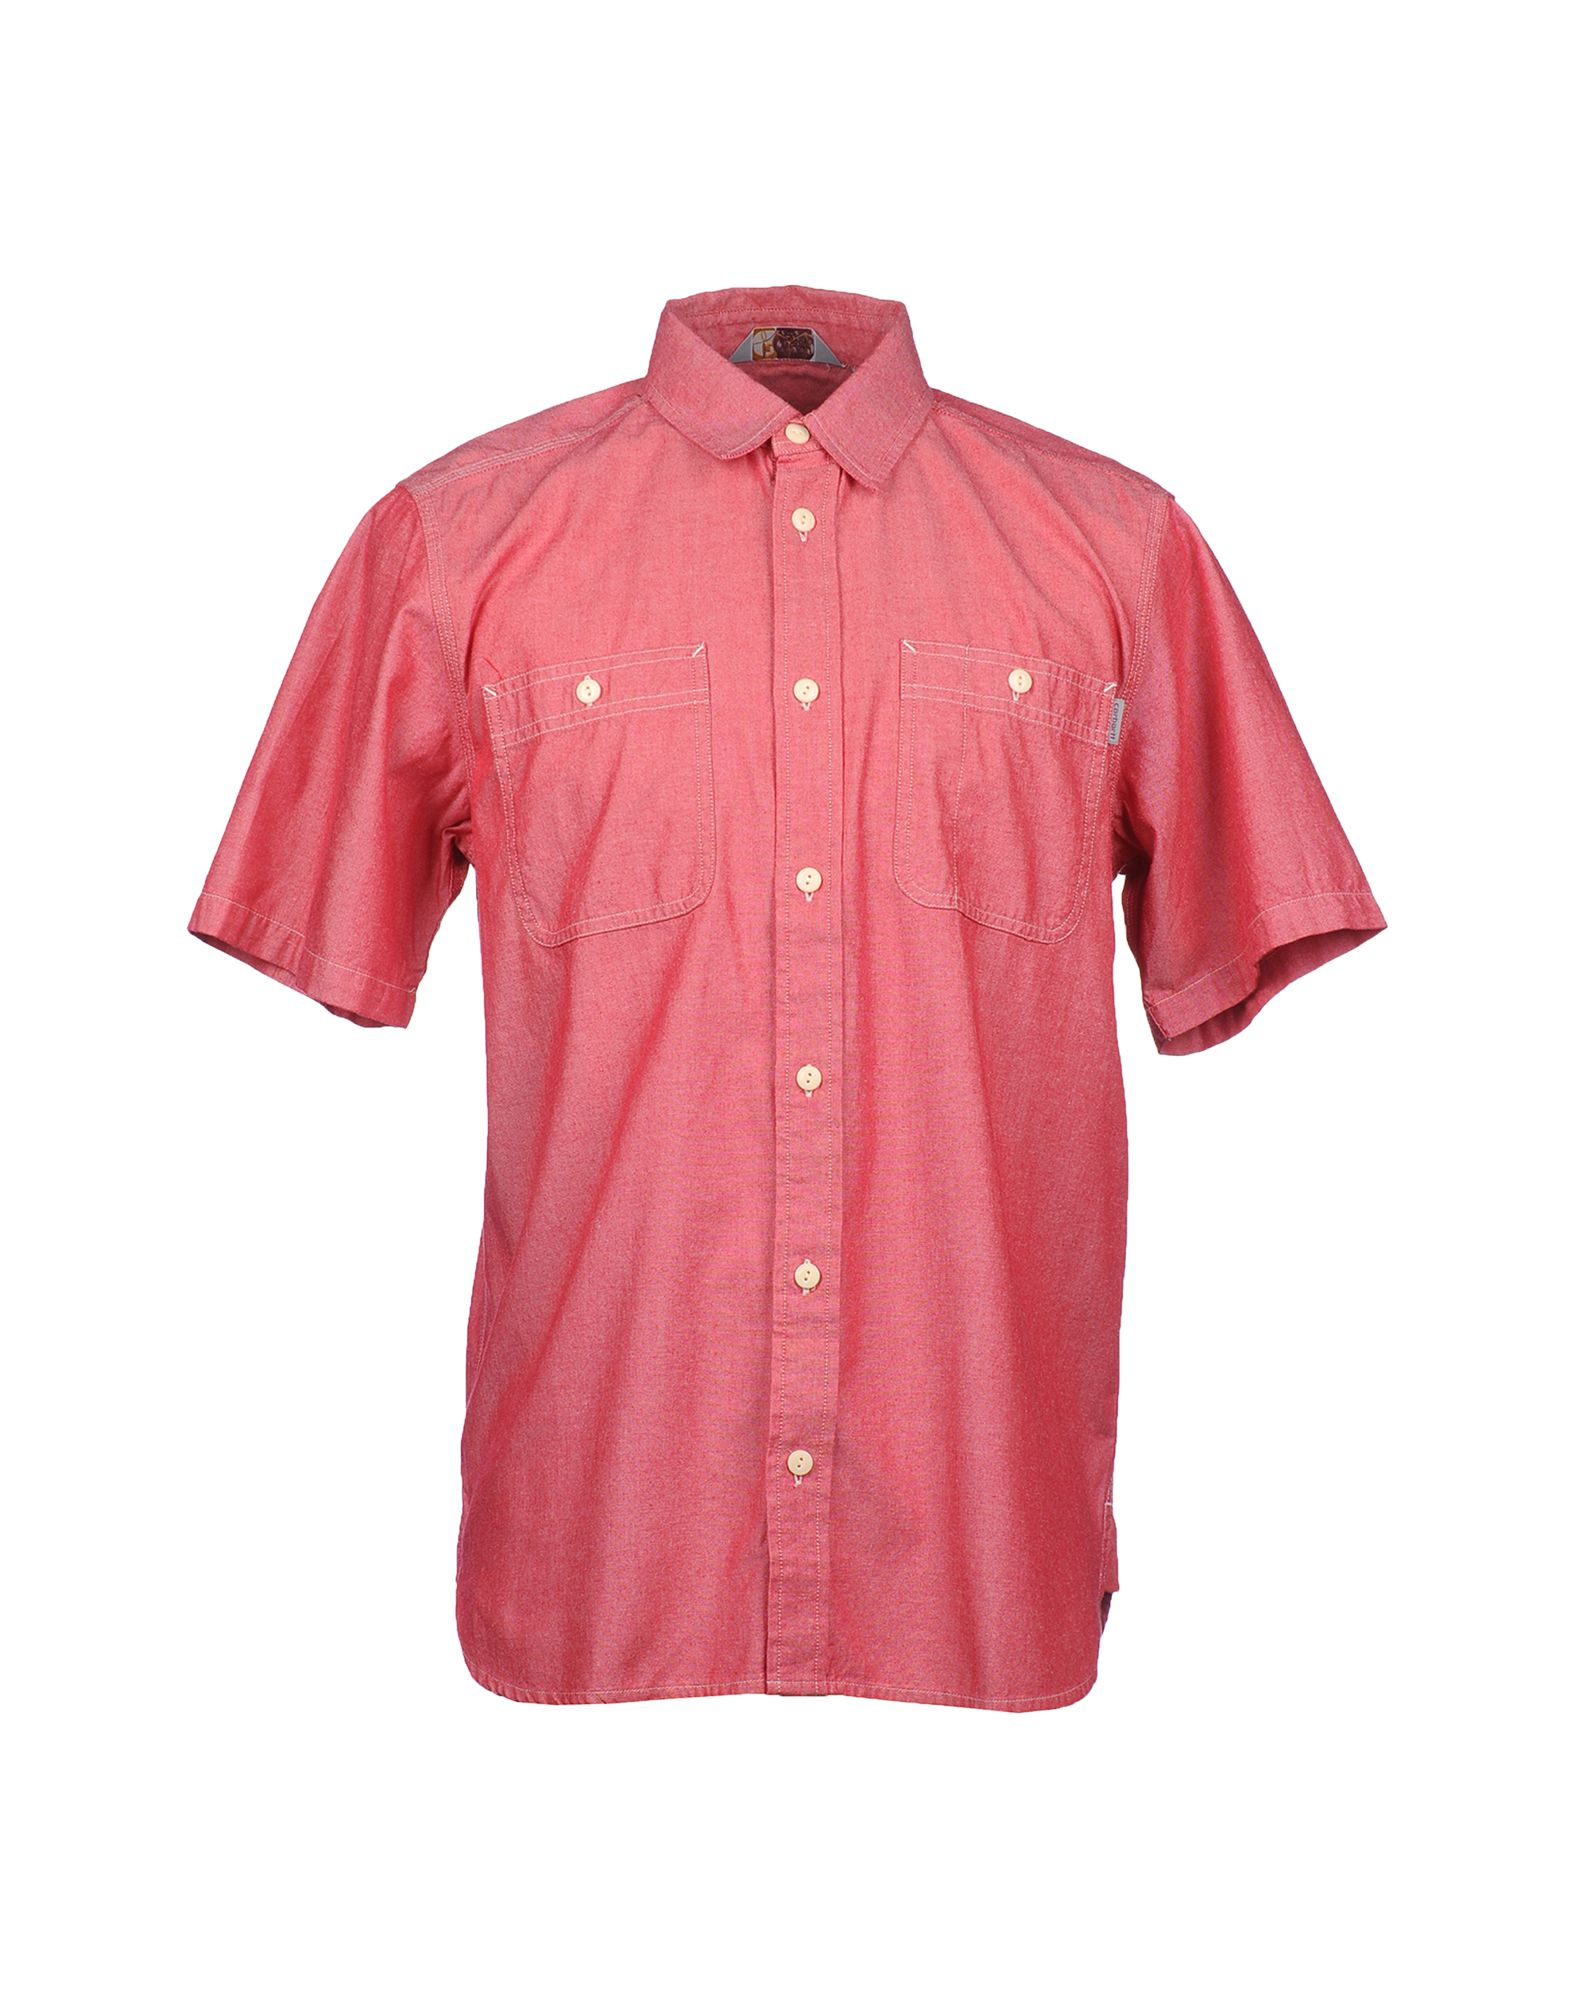 Carhartt Short Sleeve Shirt In Red For Men Lyst